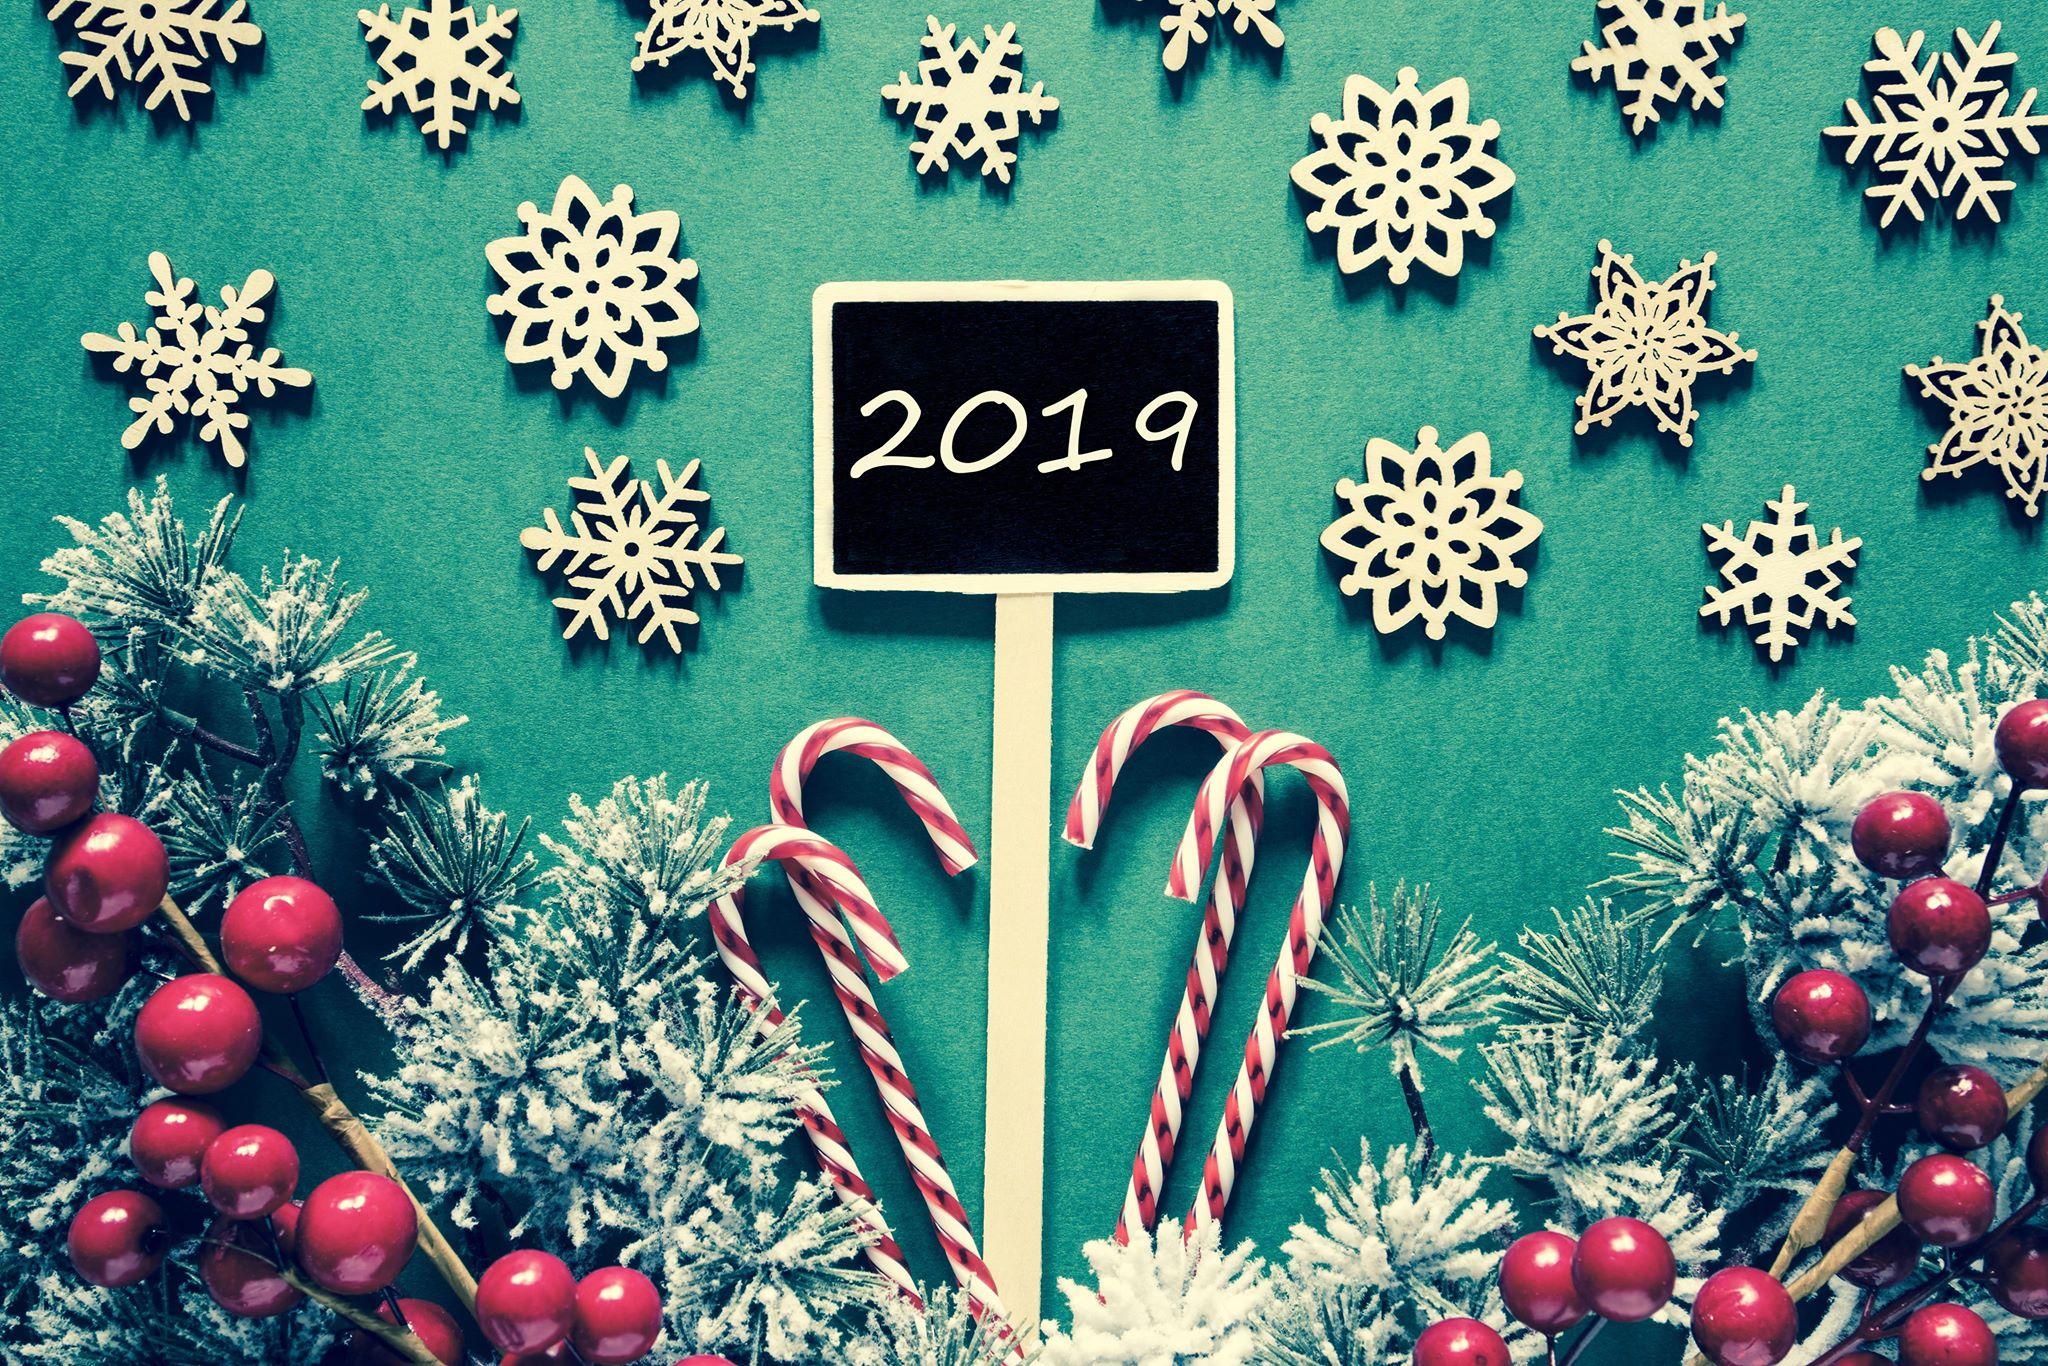 happy new year 2019 2 صور مكتوب عليها العام الجديد 2019